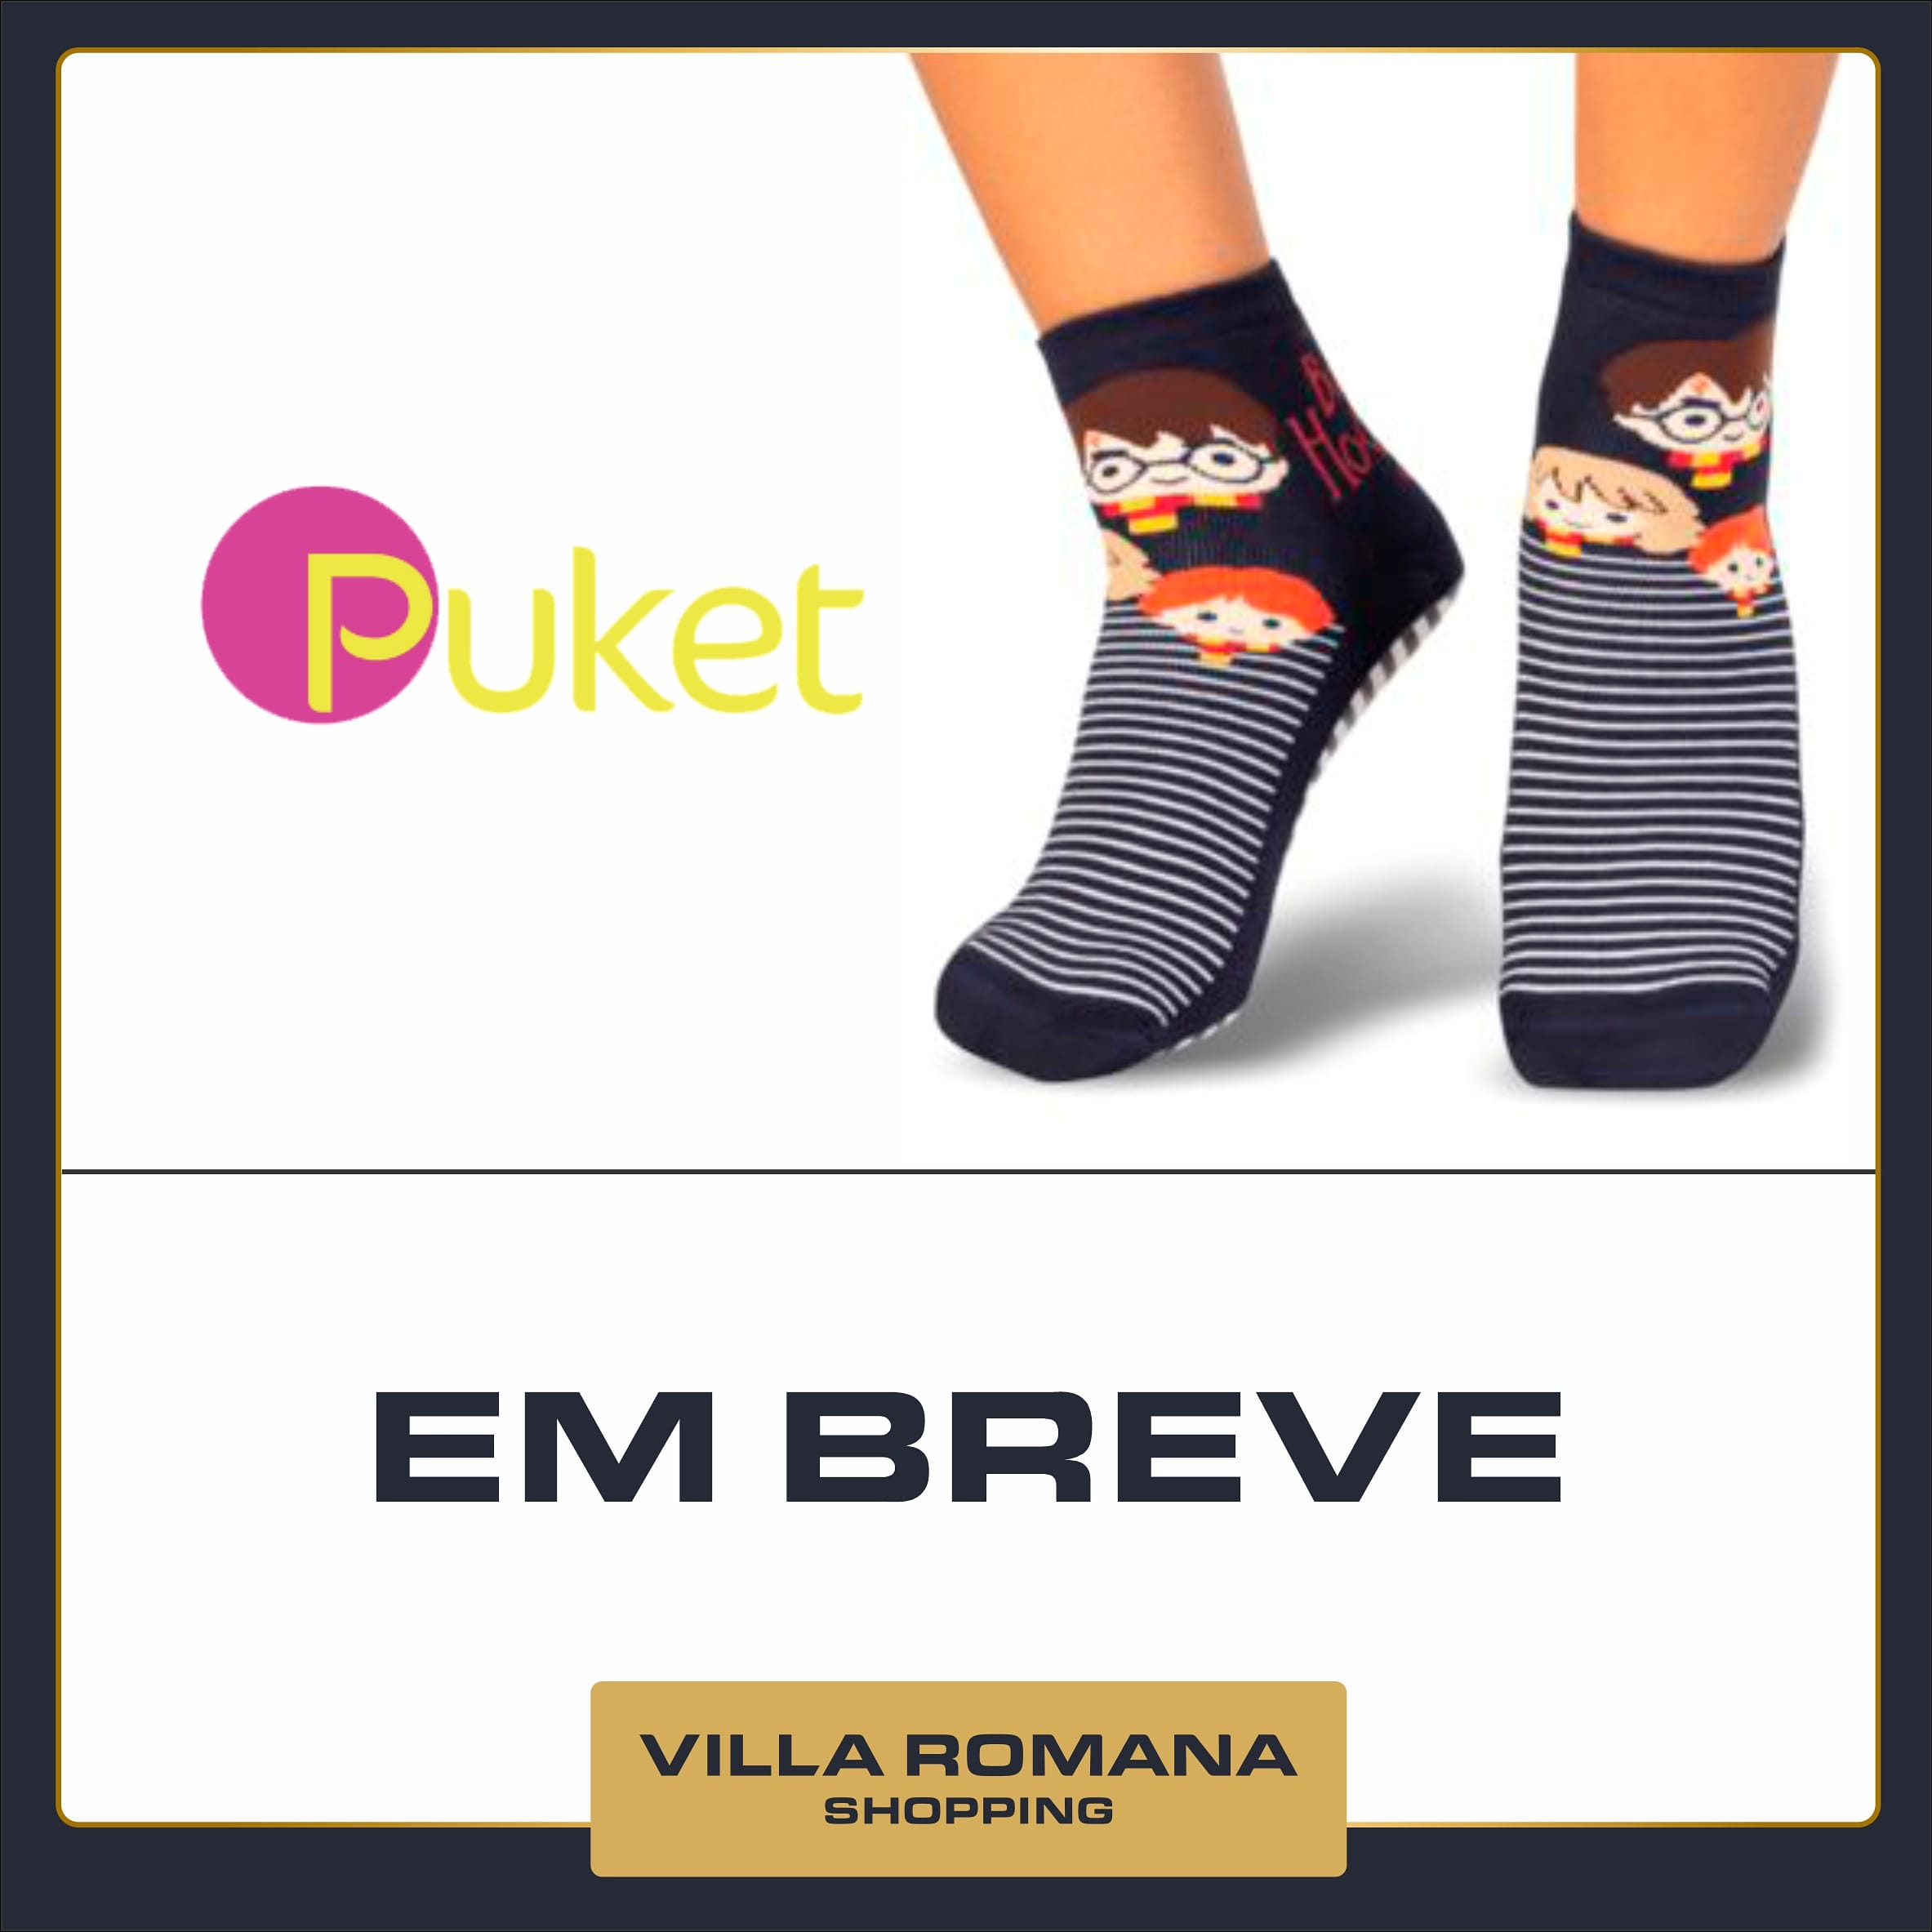 Em breve: Puket no Villa Romana Shopping